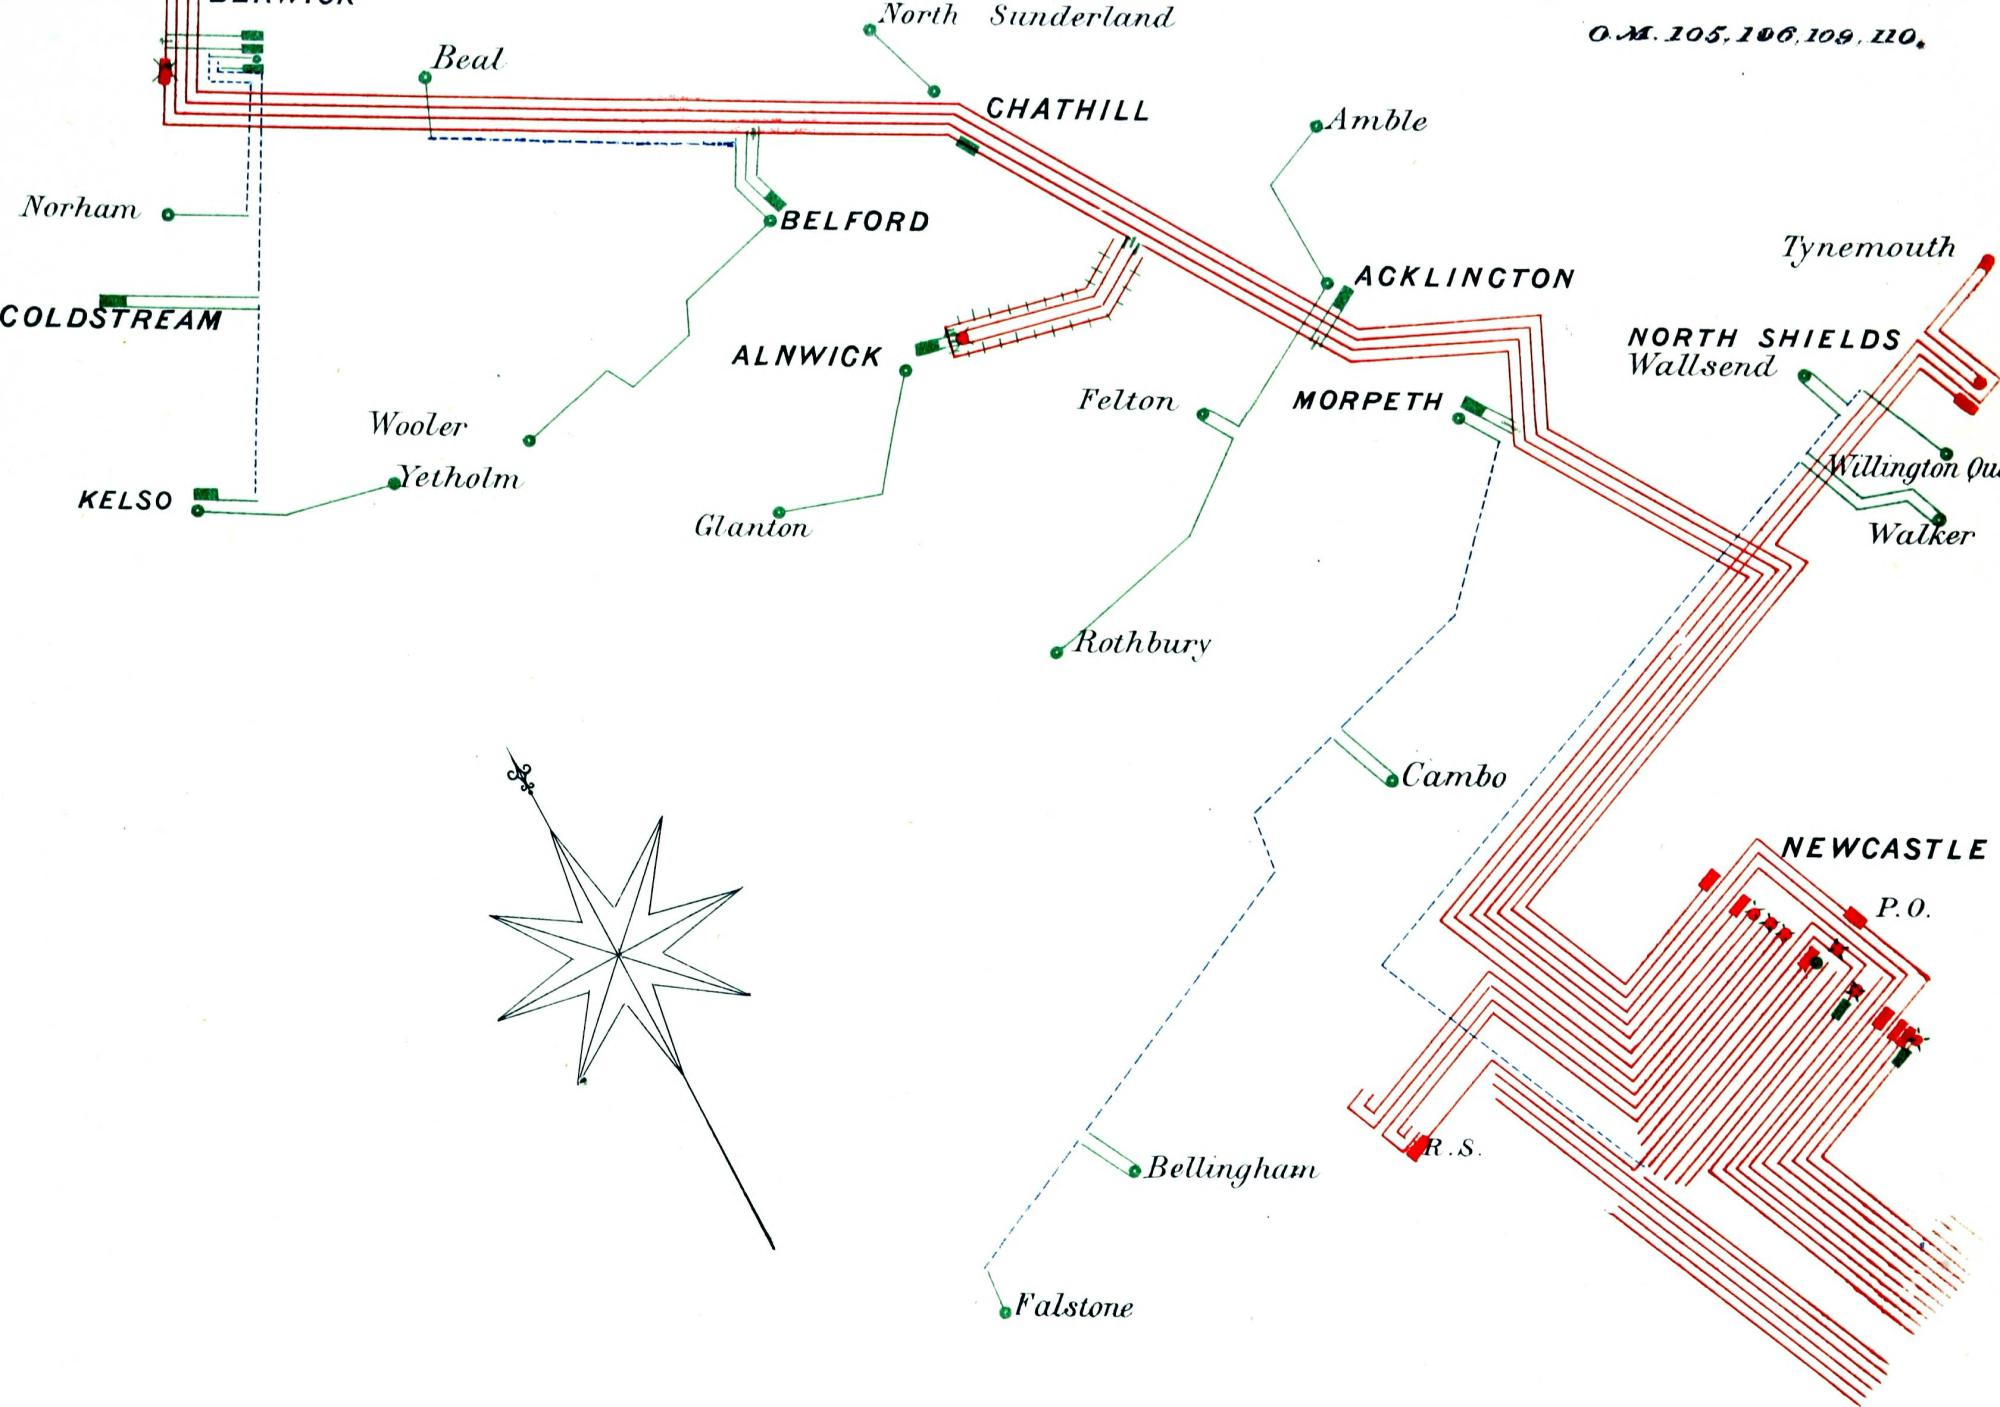 hight resolution of file electric telegraph british parliament 1857 14742123816 jpg diagram of electric telegraph